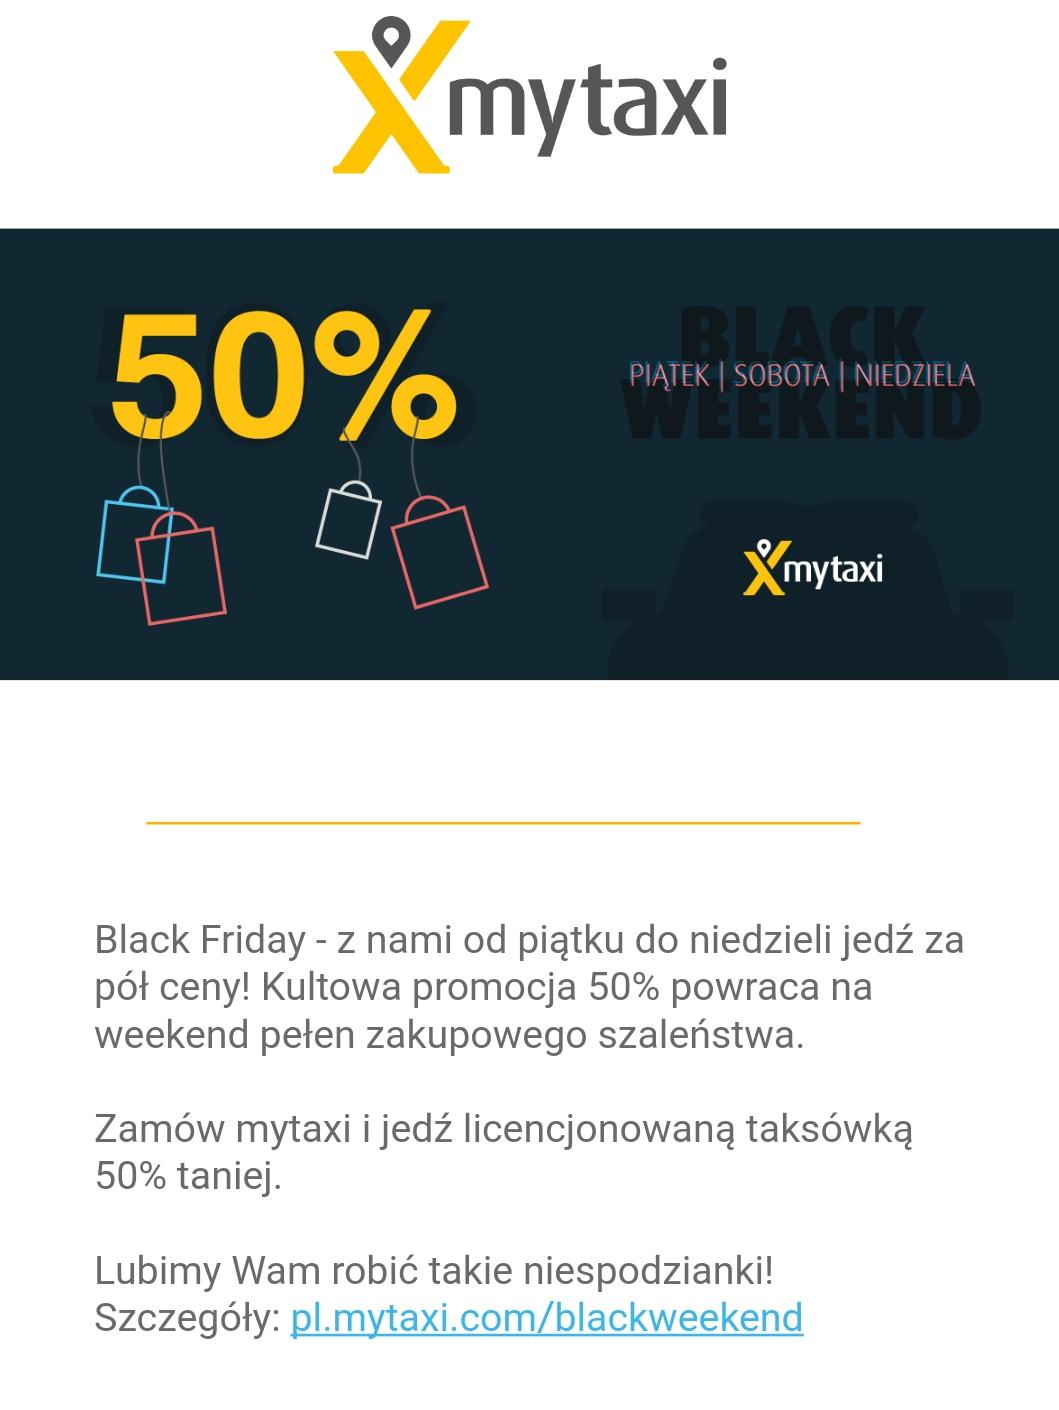 BlackFriday @MyTaxi -50% Promocja obowiązuje od 24 do 26 listopada